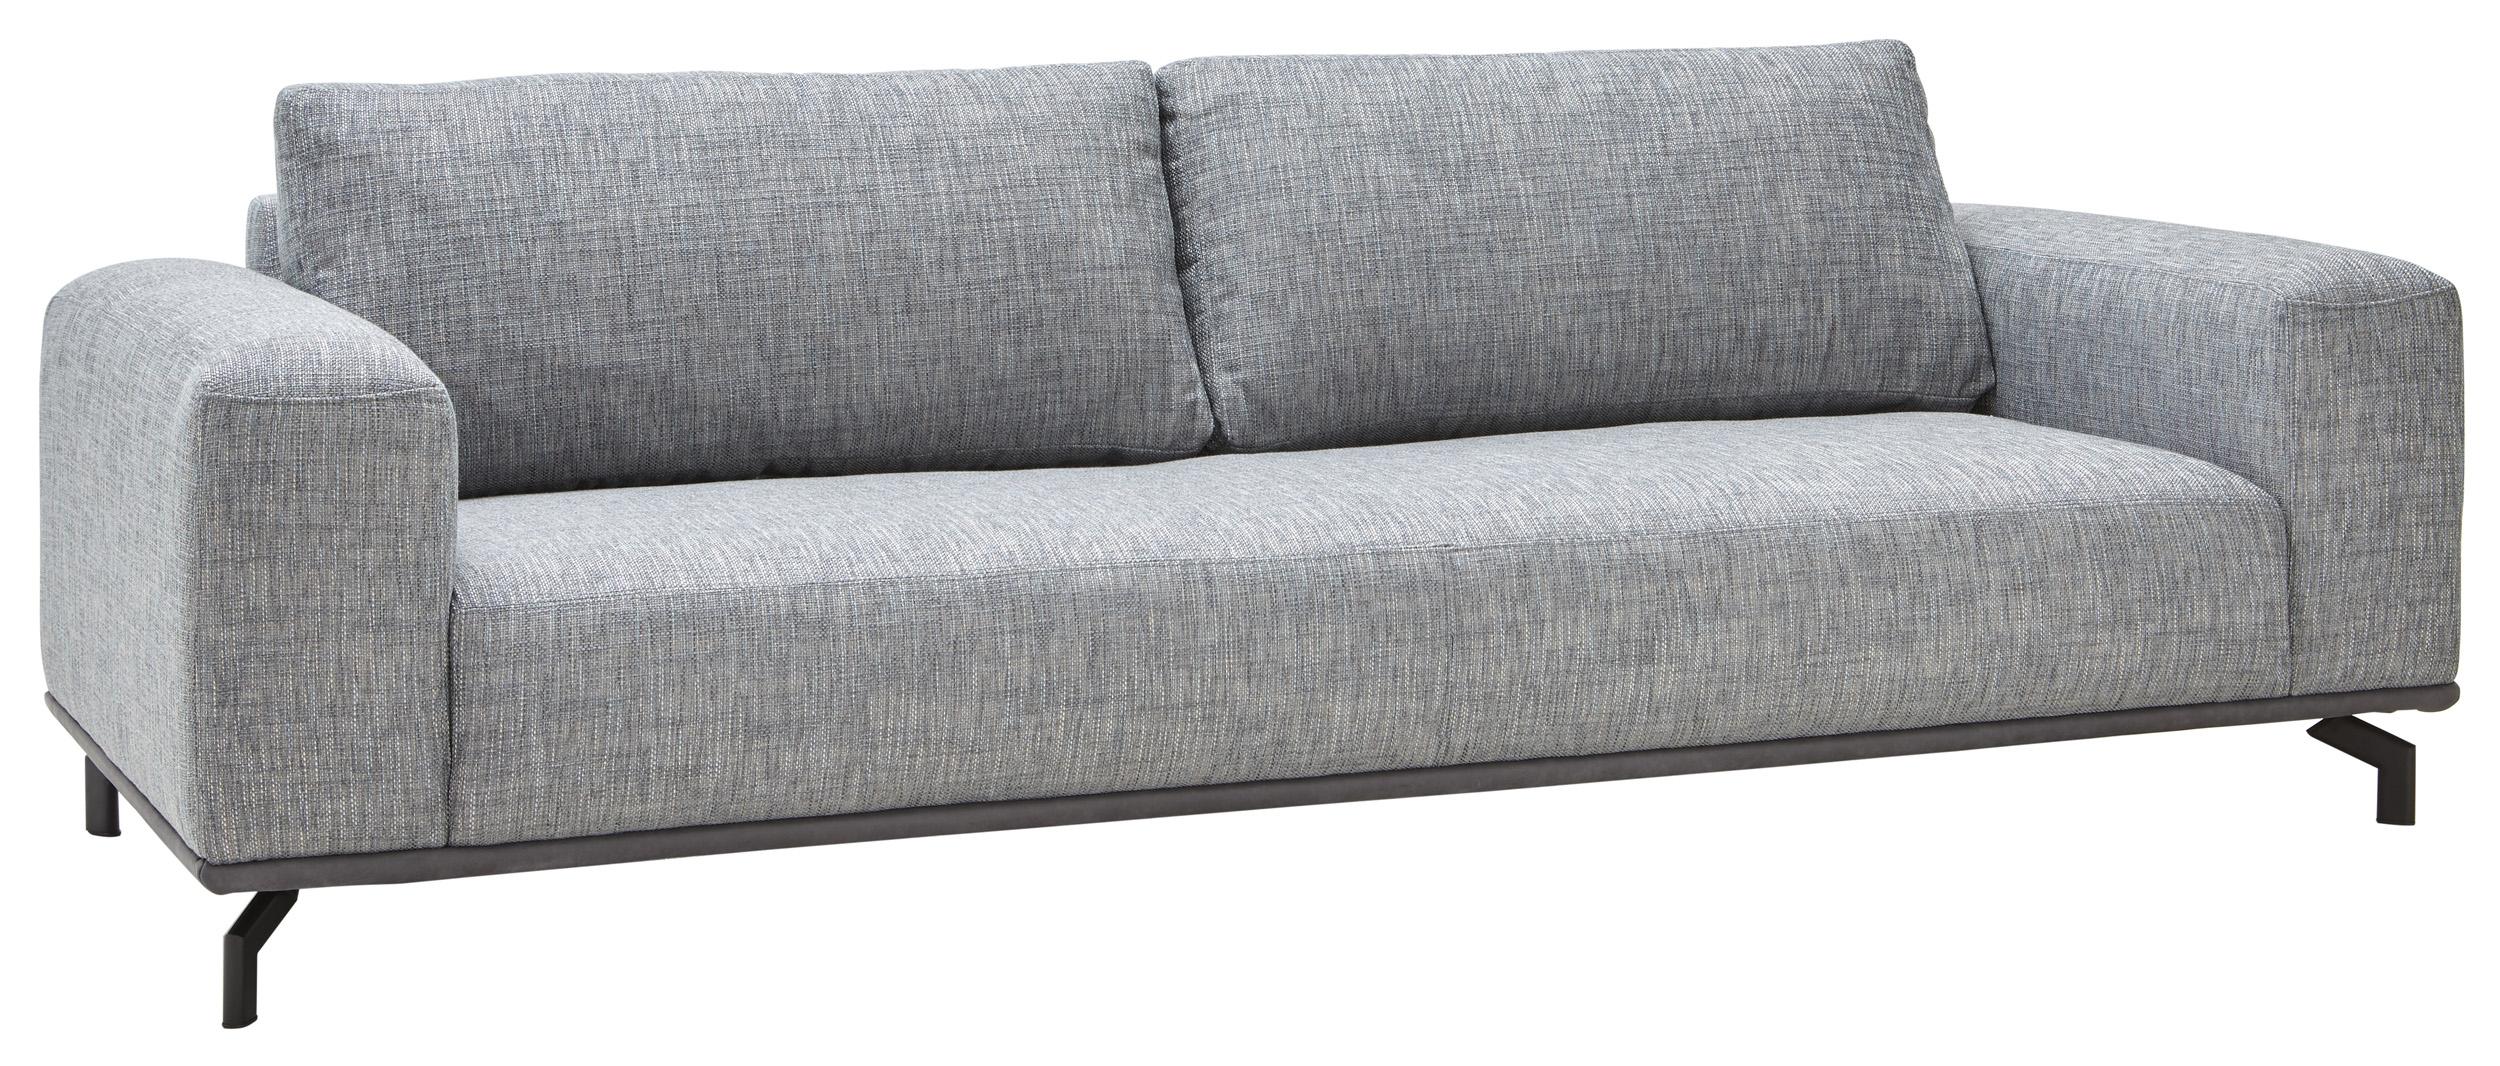 Full Size of Sofa Louisiana (3 Sitzer Mit Polster Grau) Rattan 3 Sitzer Grau Schlaffunktion Leder Couch 2 Und Retro Kingsley 3 Sitzer Ikea Samt Nino Schwarz/grau Natura Sofa Sofa 3 Sitzer Grau